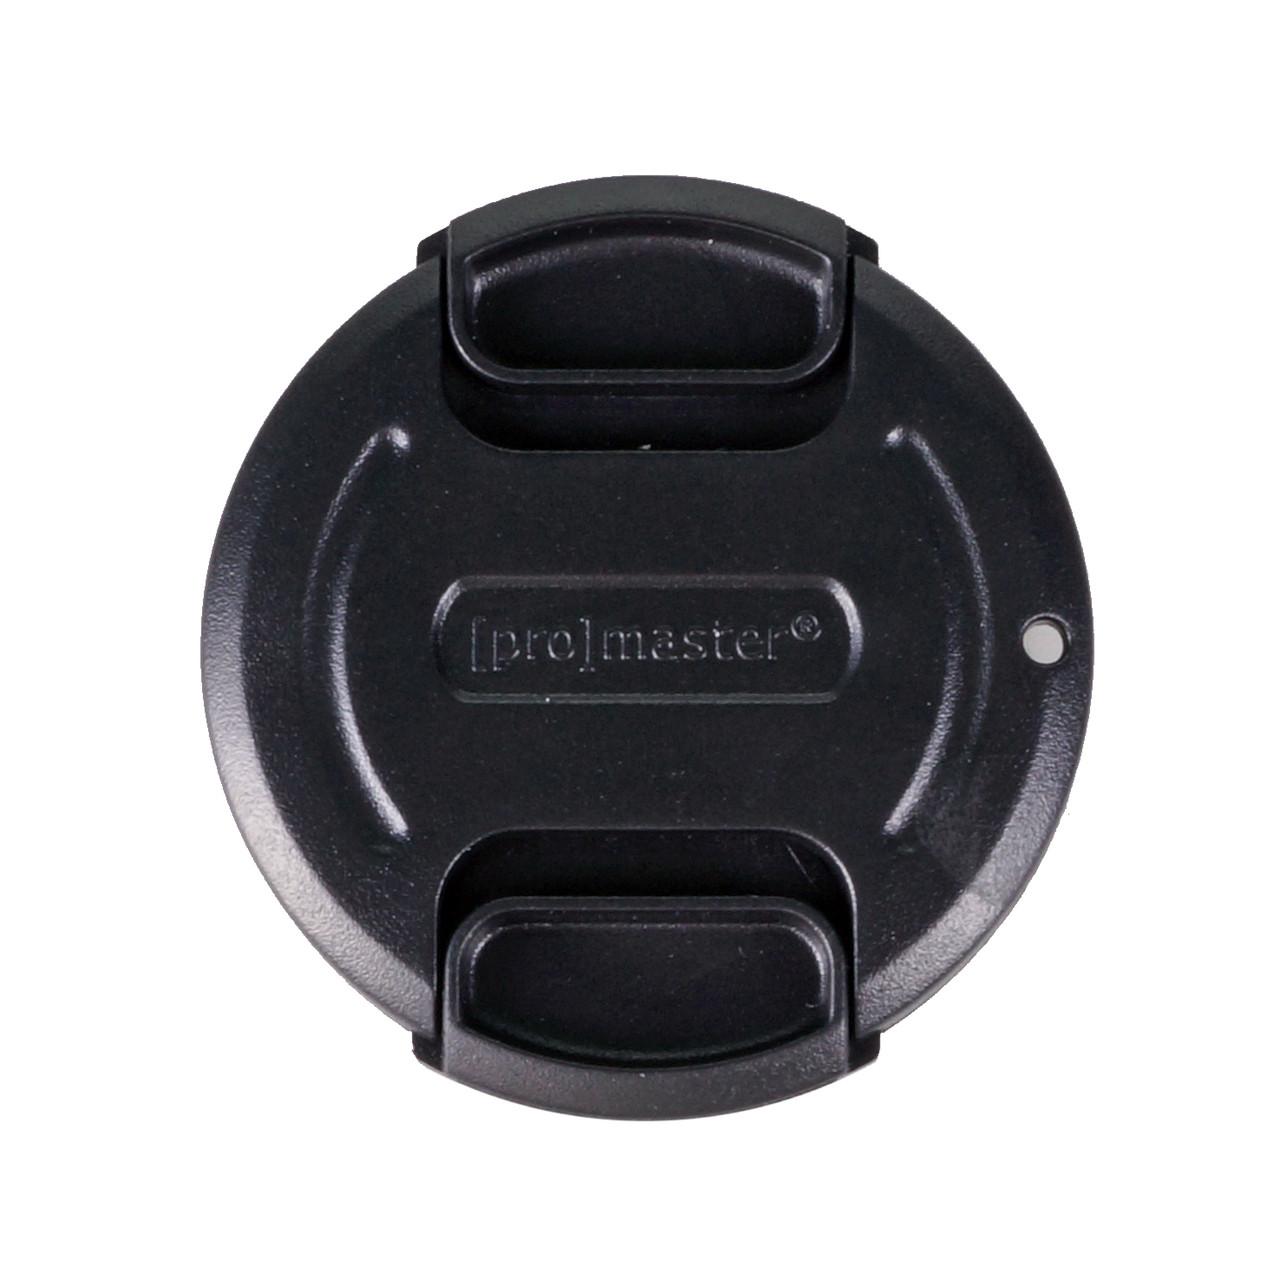 PromasterR Professional Snap On Lens Cap